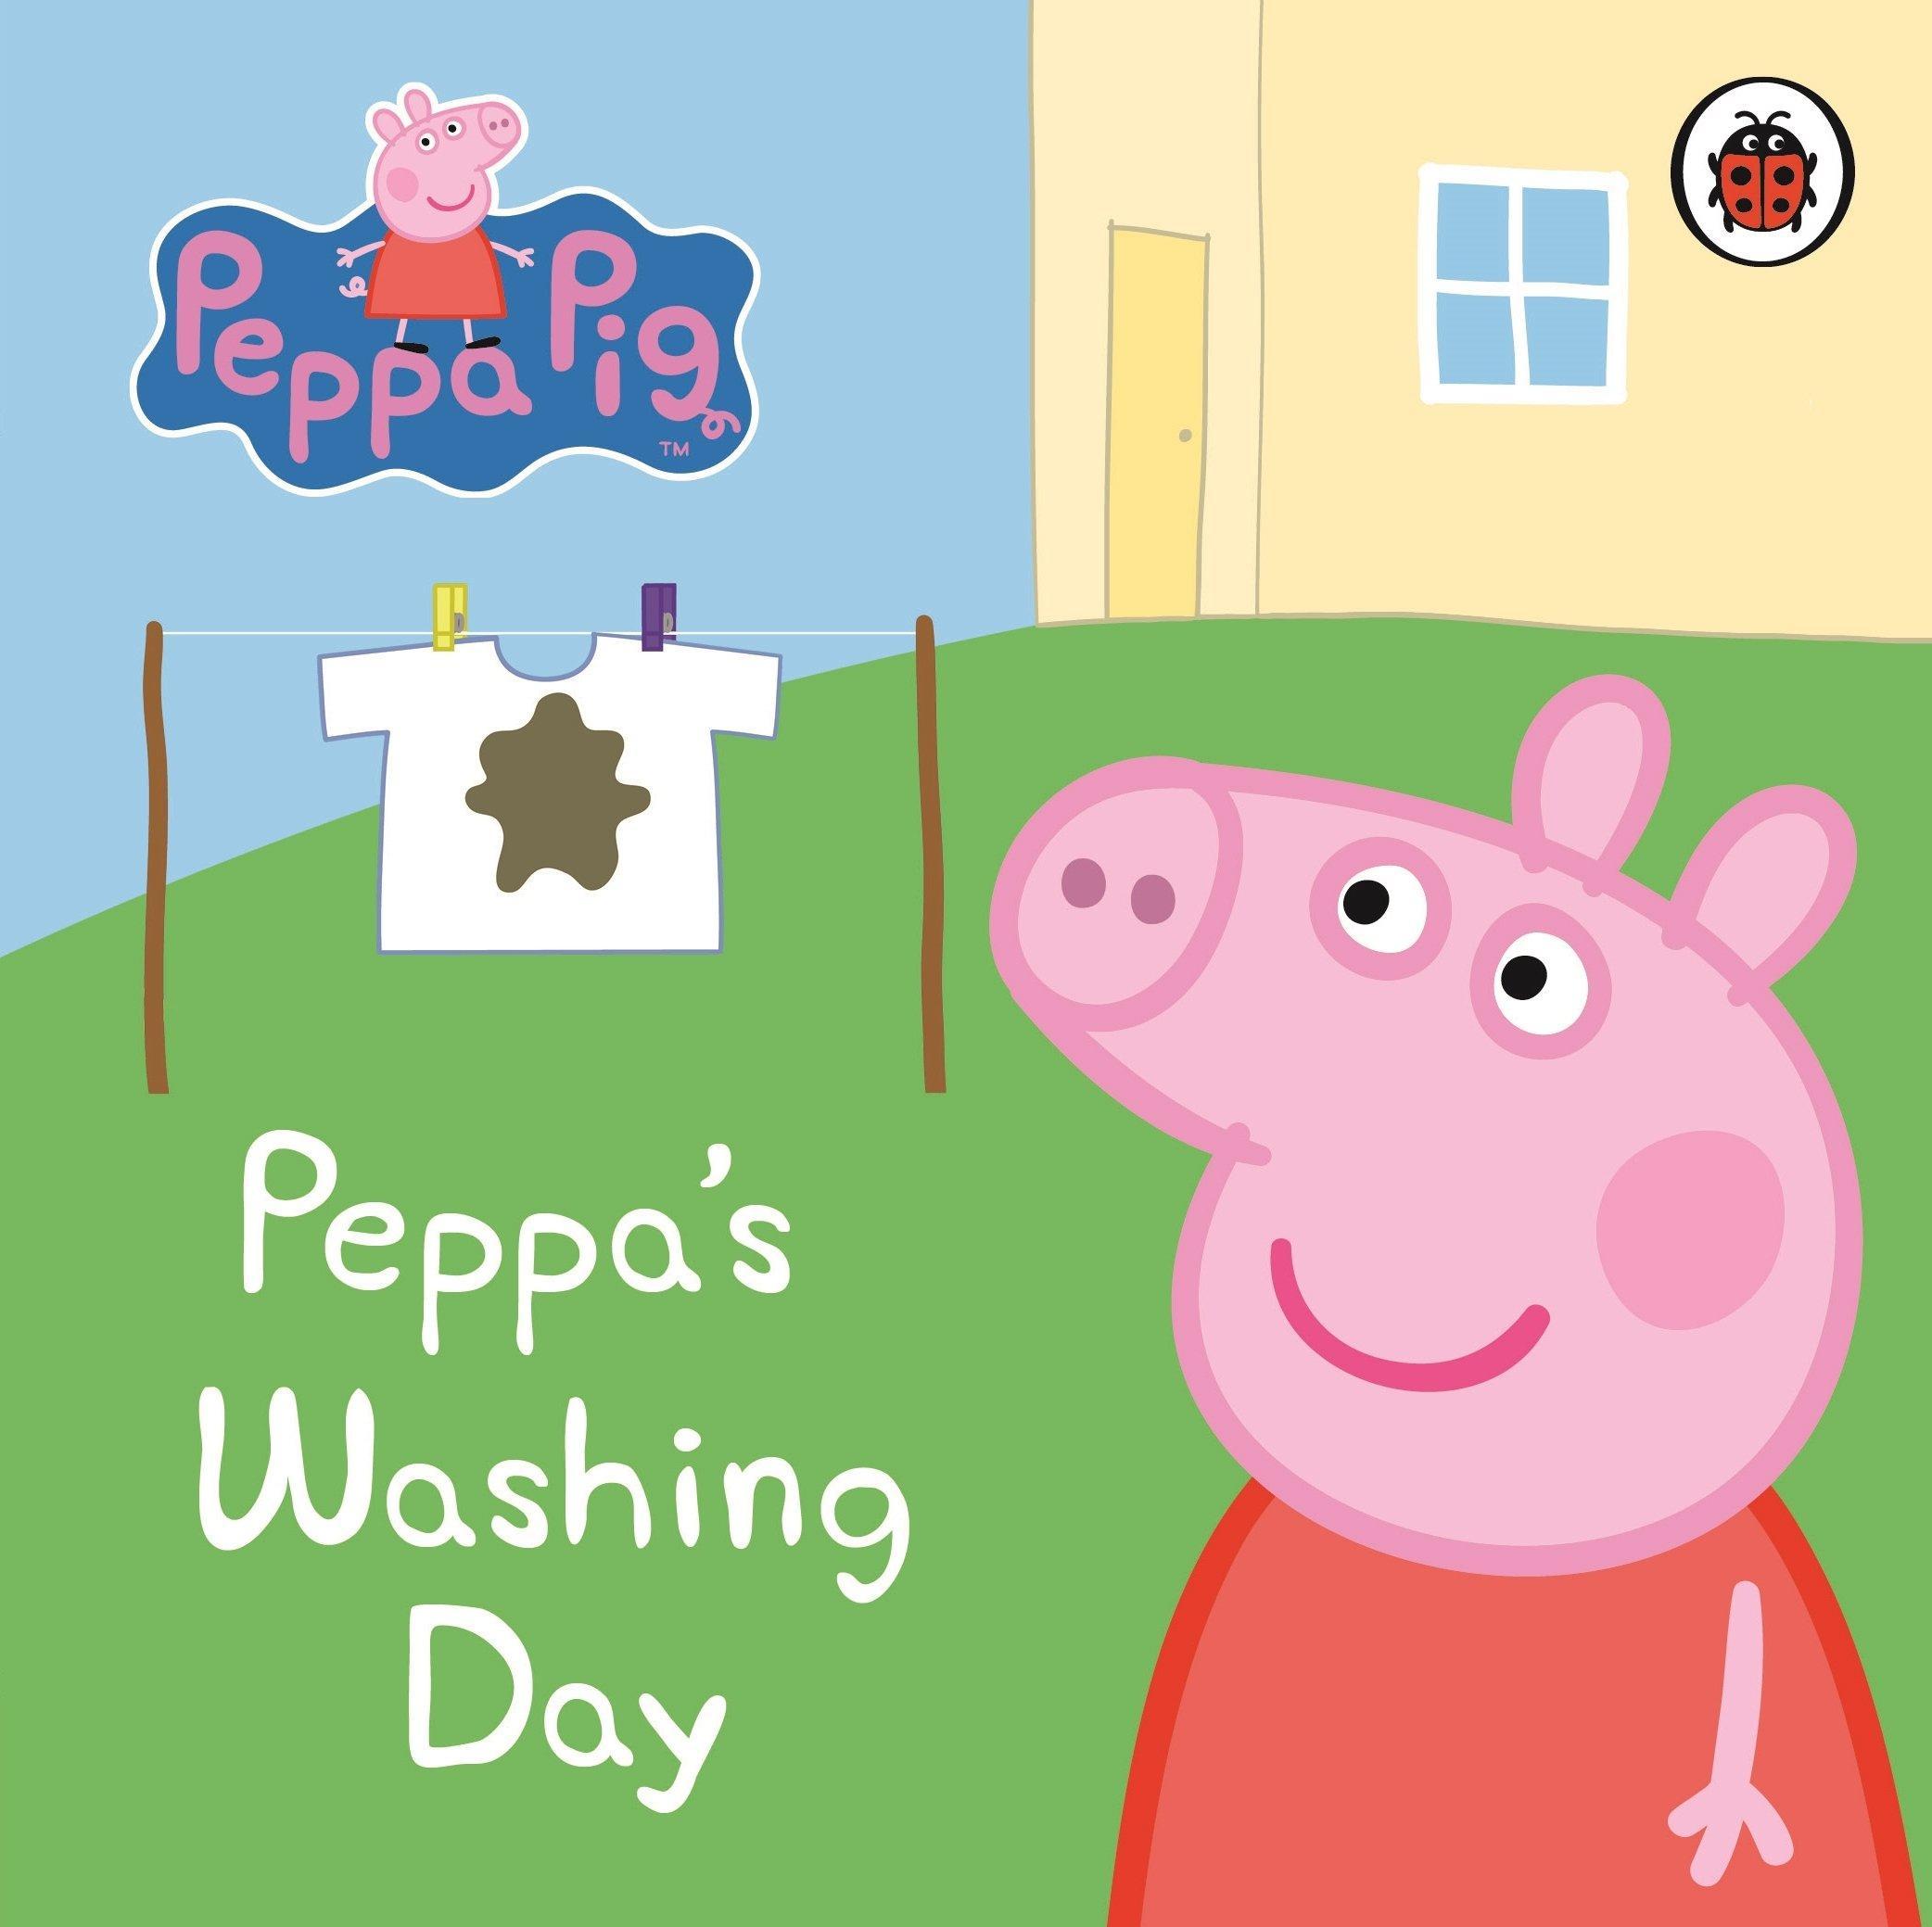 Peppa Pig Mmbookmarket Angol Knyvek Ruhza Antikvrium J S Peppas First Sleepover Washing Day